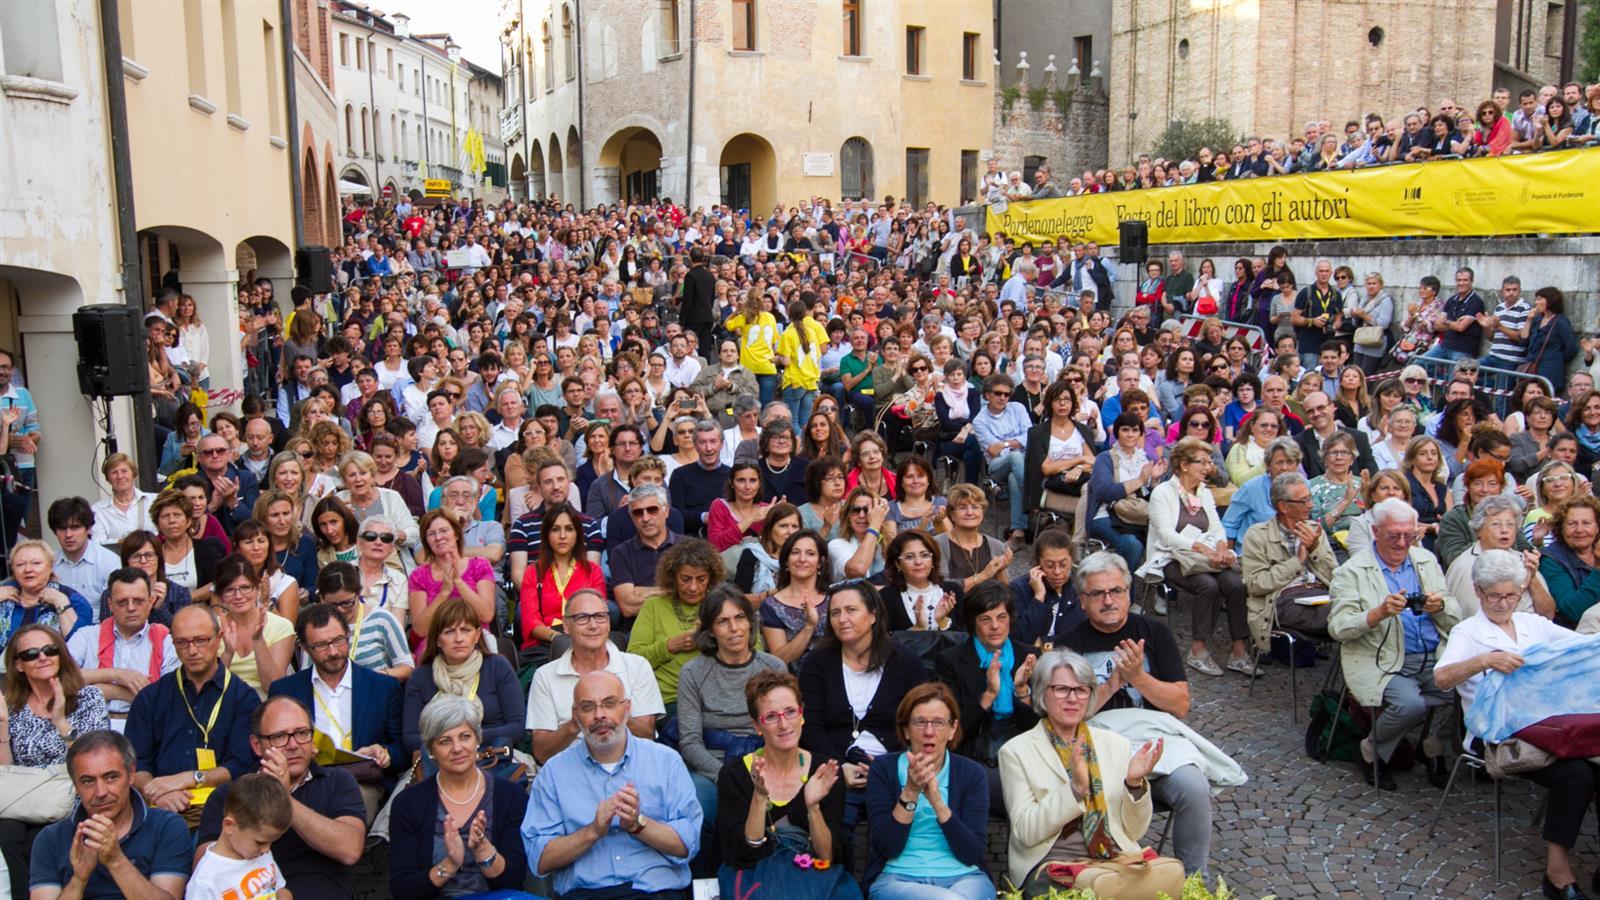 Pordenonelegge_Duomo_ph_Gigi_Cozzarin.jpg